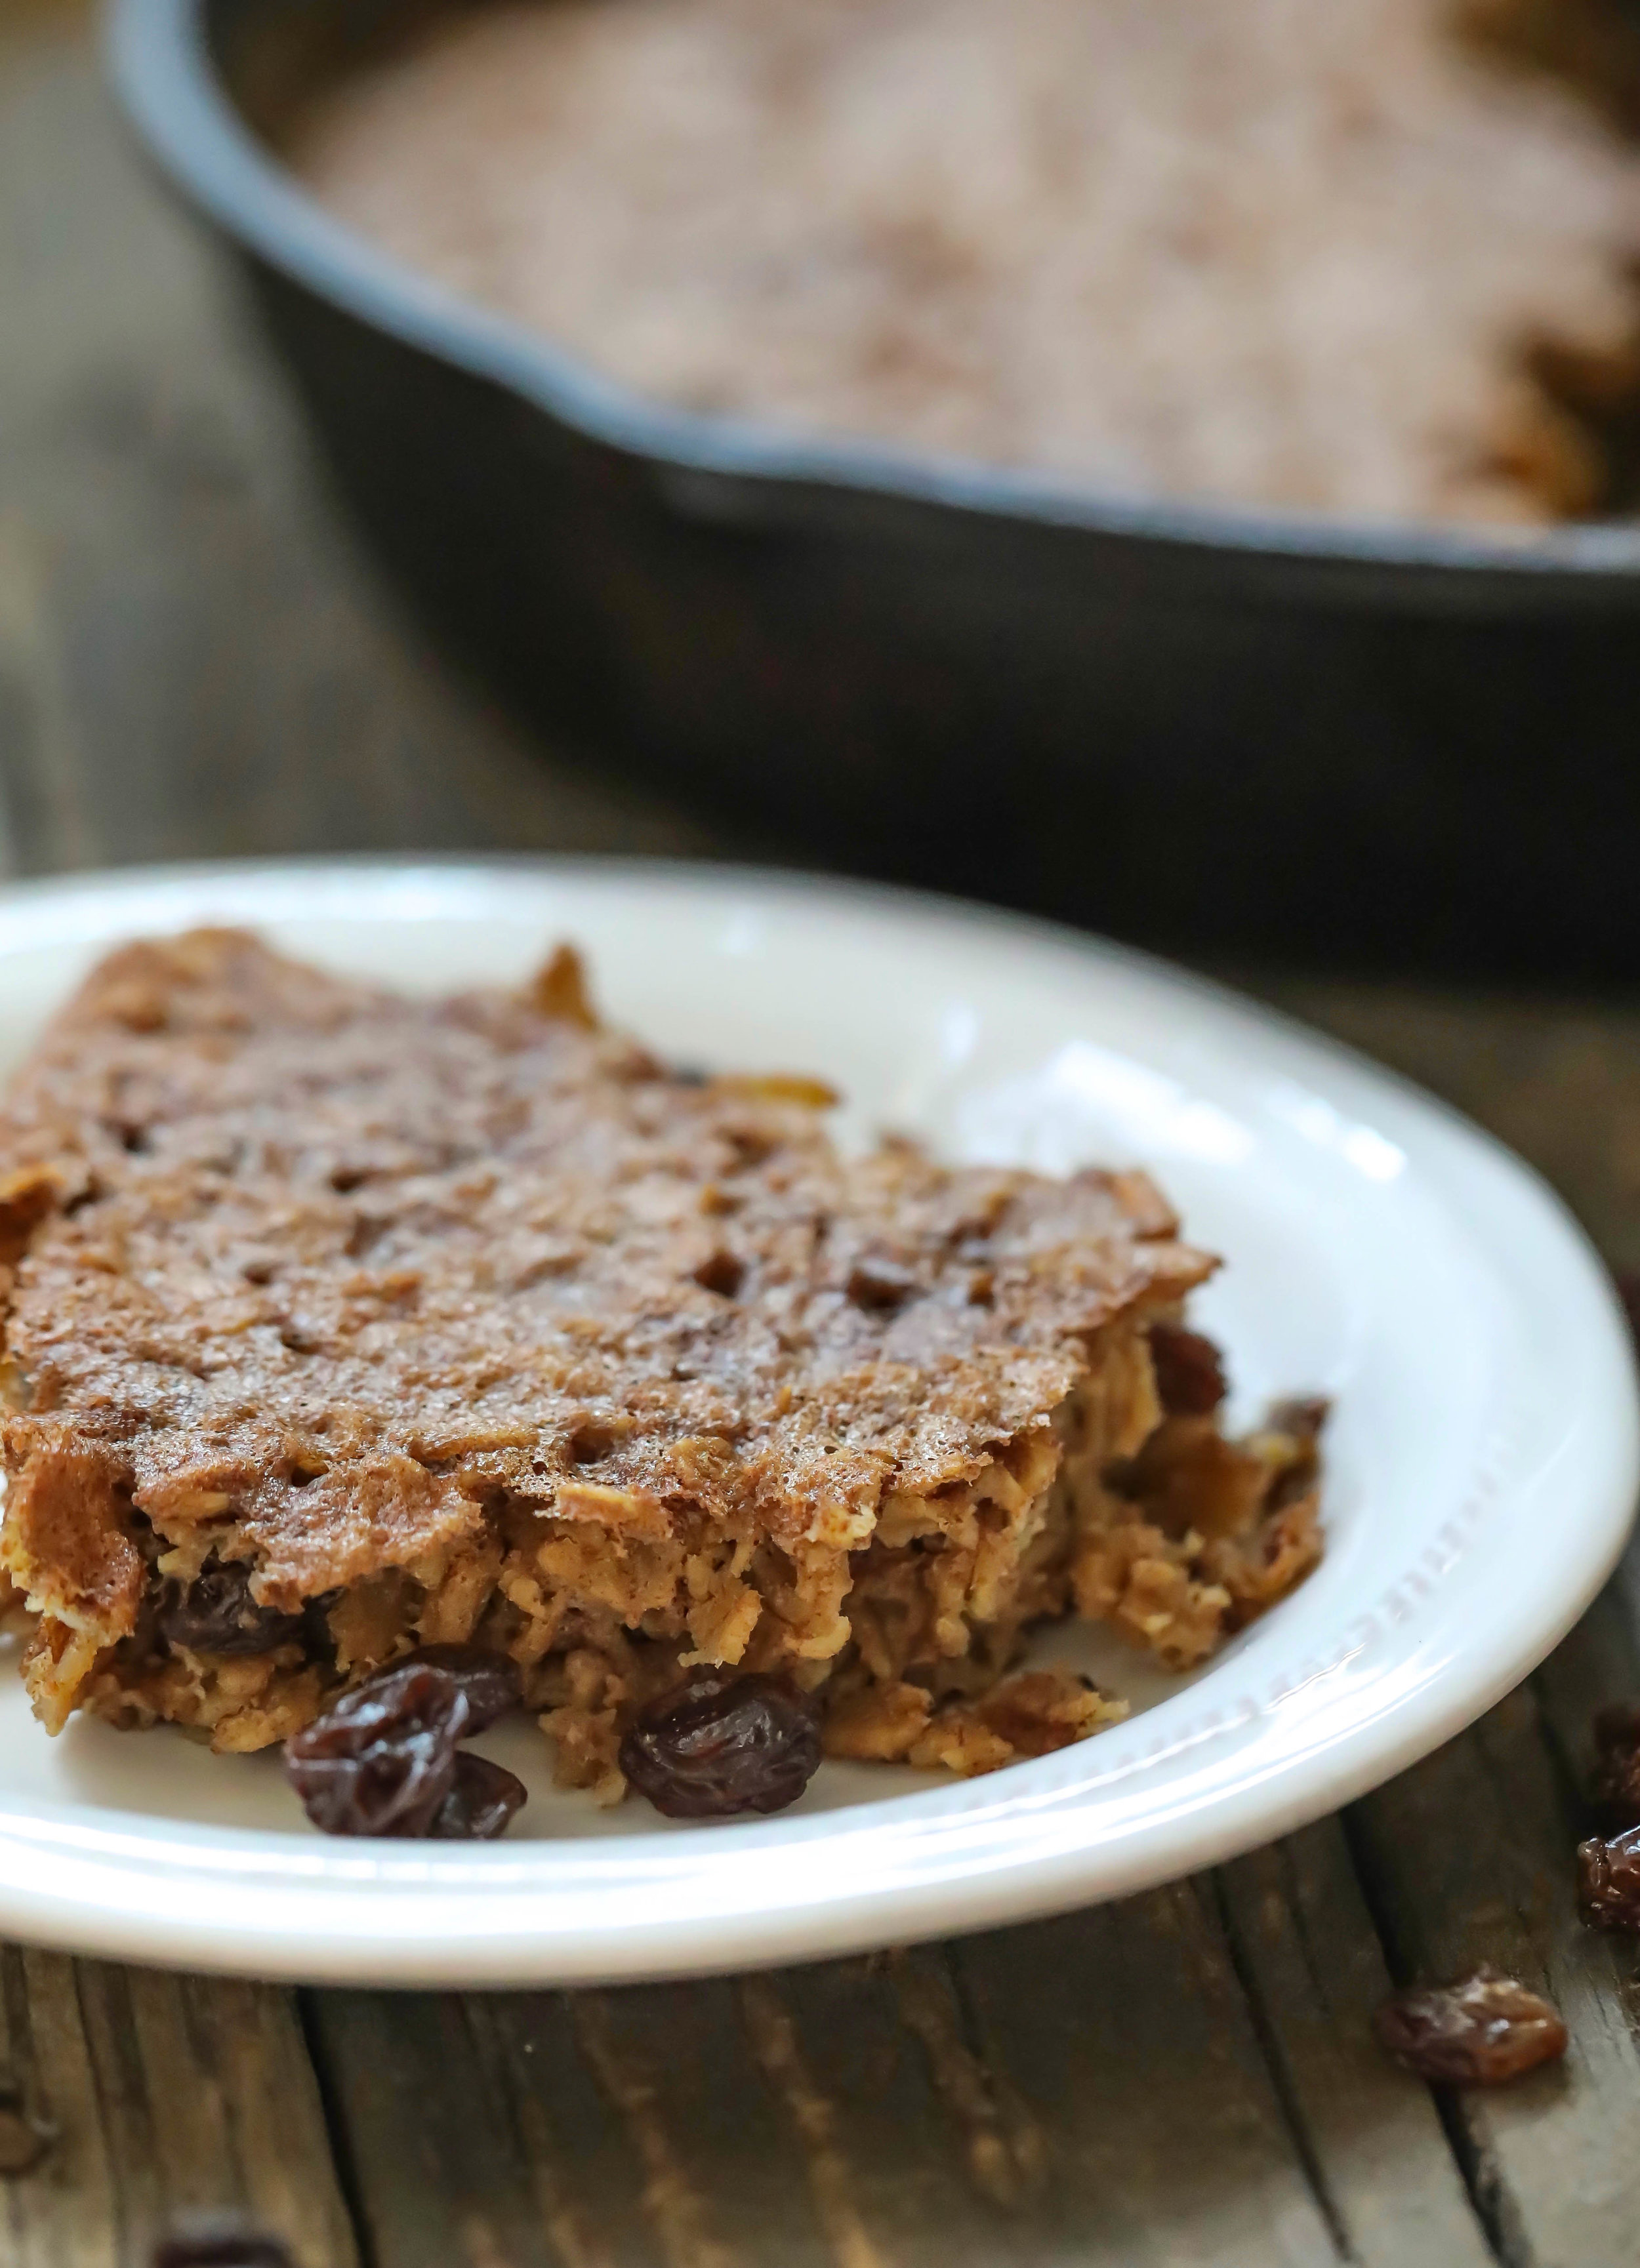 Cinnamon Raisin Oatmeal Bake